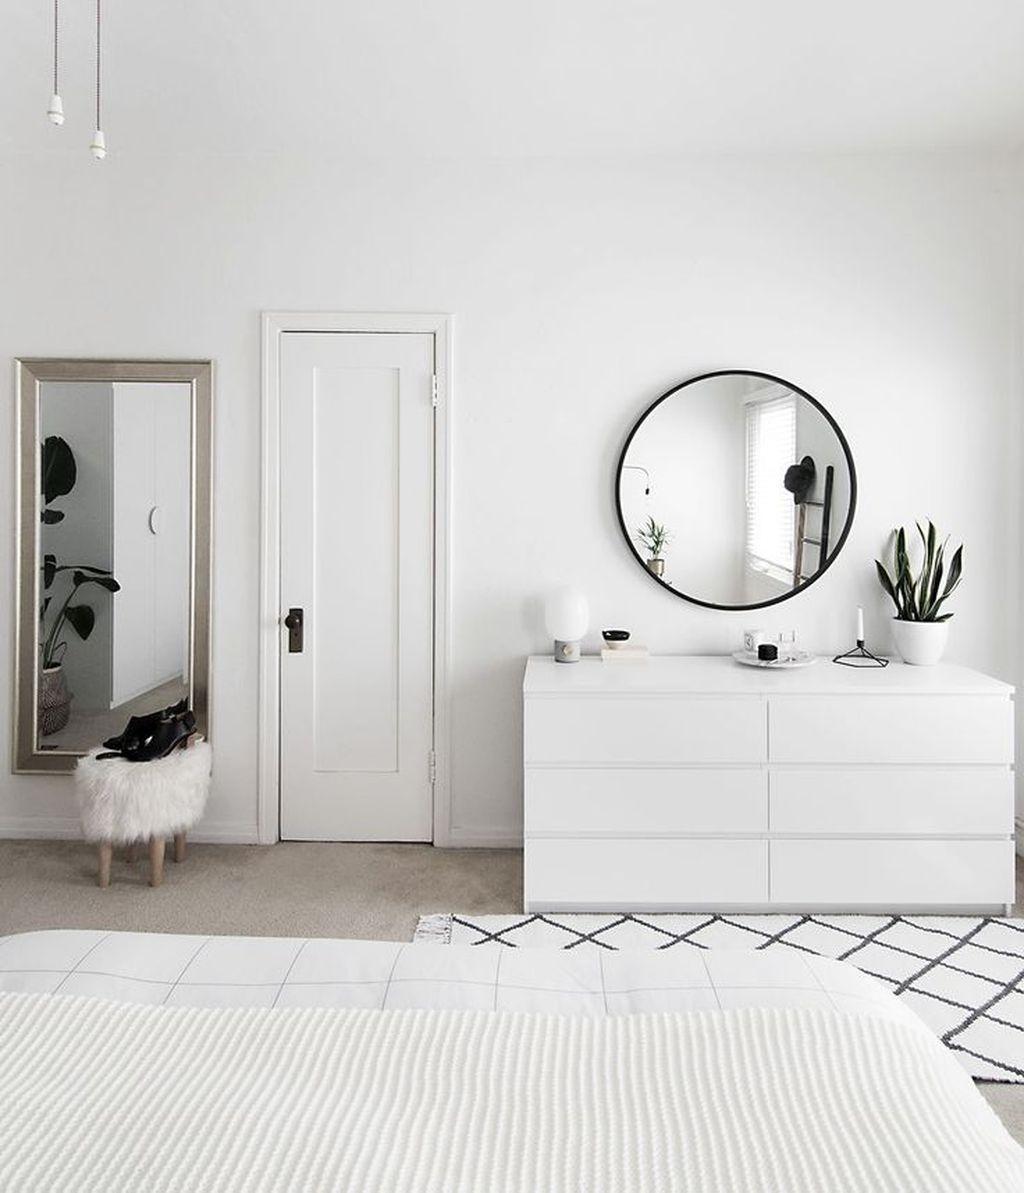 Awesome Modern Minimalist Home Decor Ideas 24